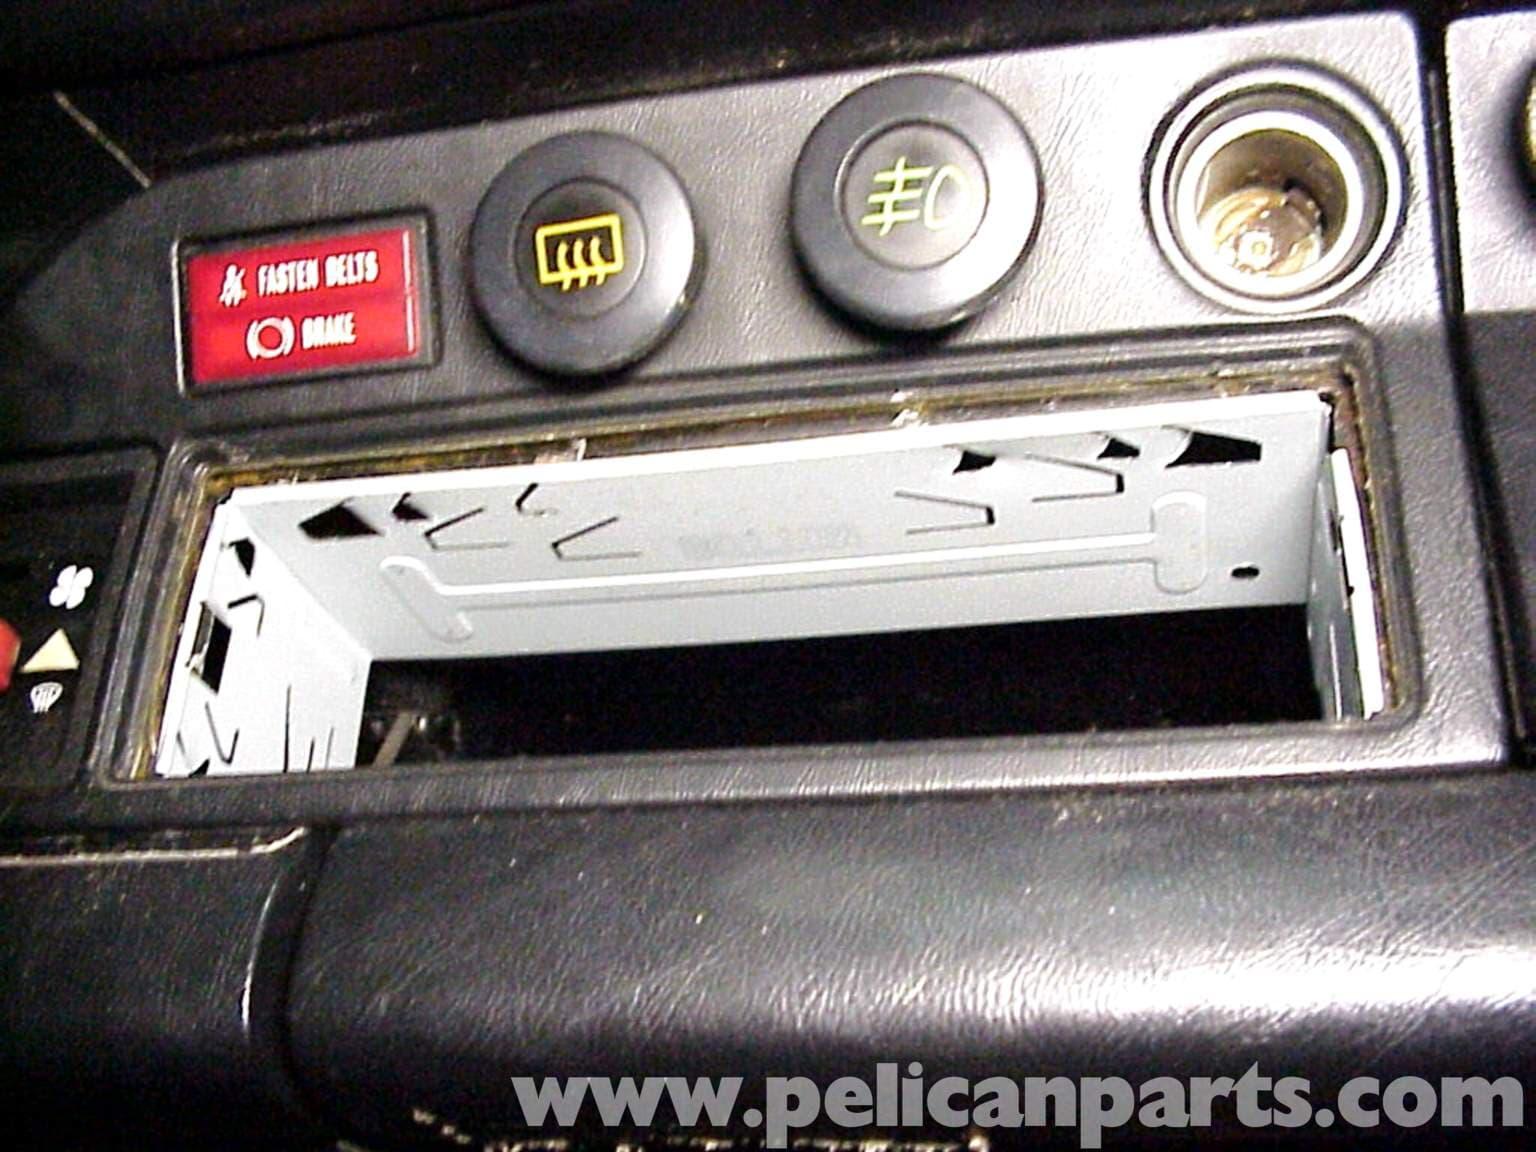 1965 porsche 911 parts diagram wiring schematic wiring diagramparts manual diagram front suspension components porsche 911 stereo installation 911 (1965 89) 930 turbo (1975 891965 porsche 911